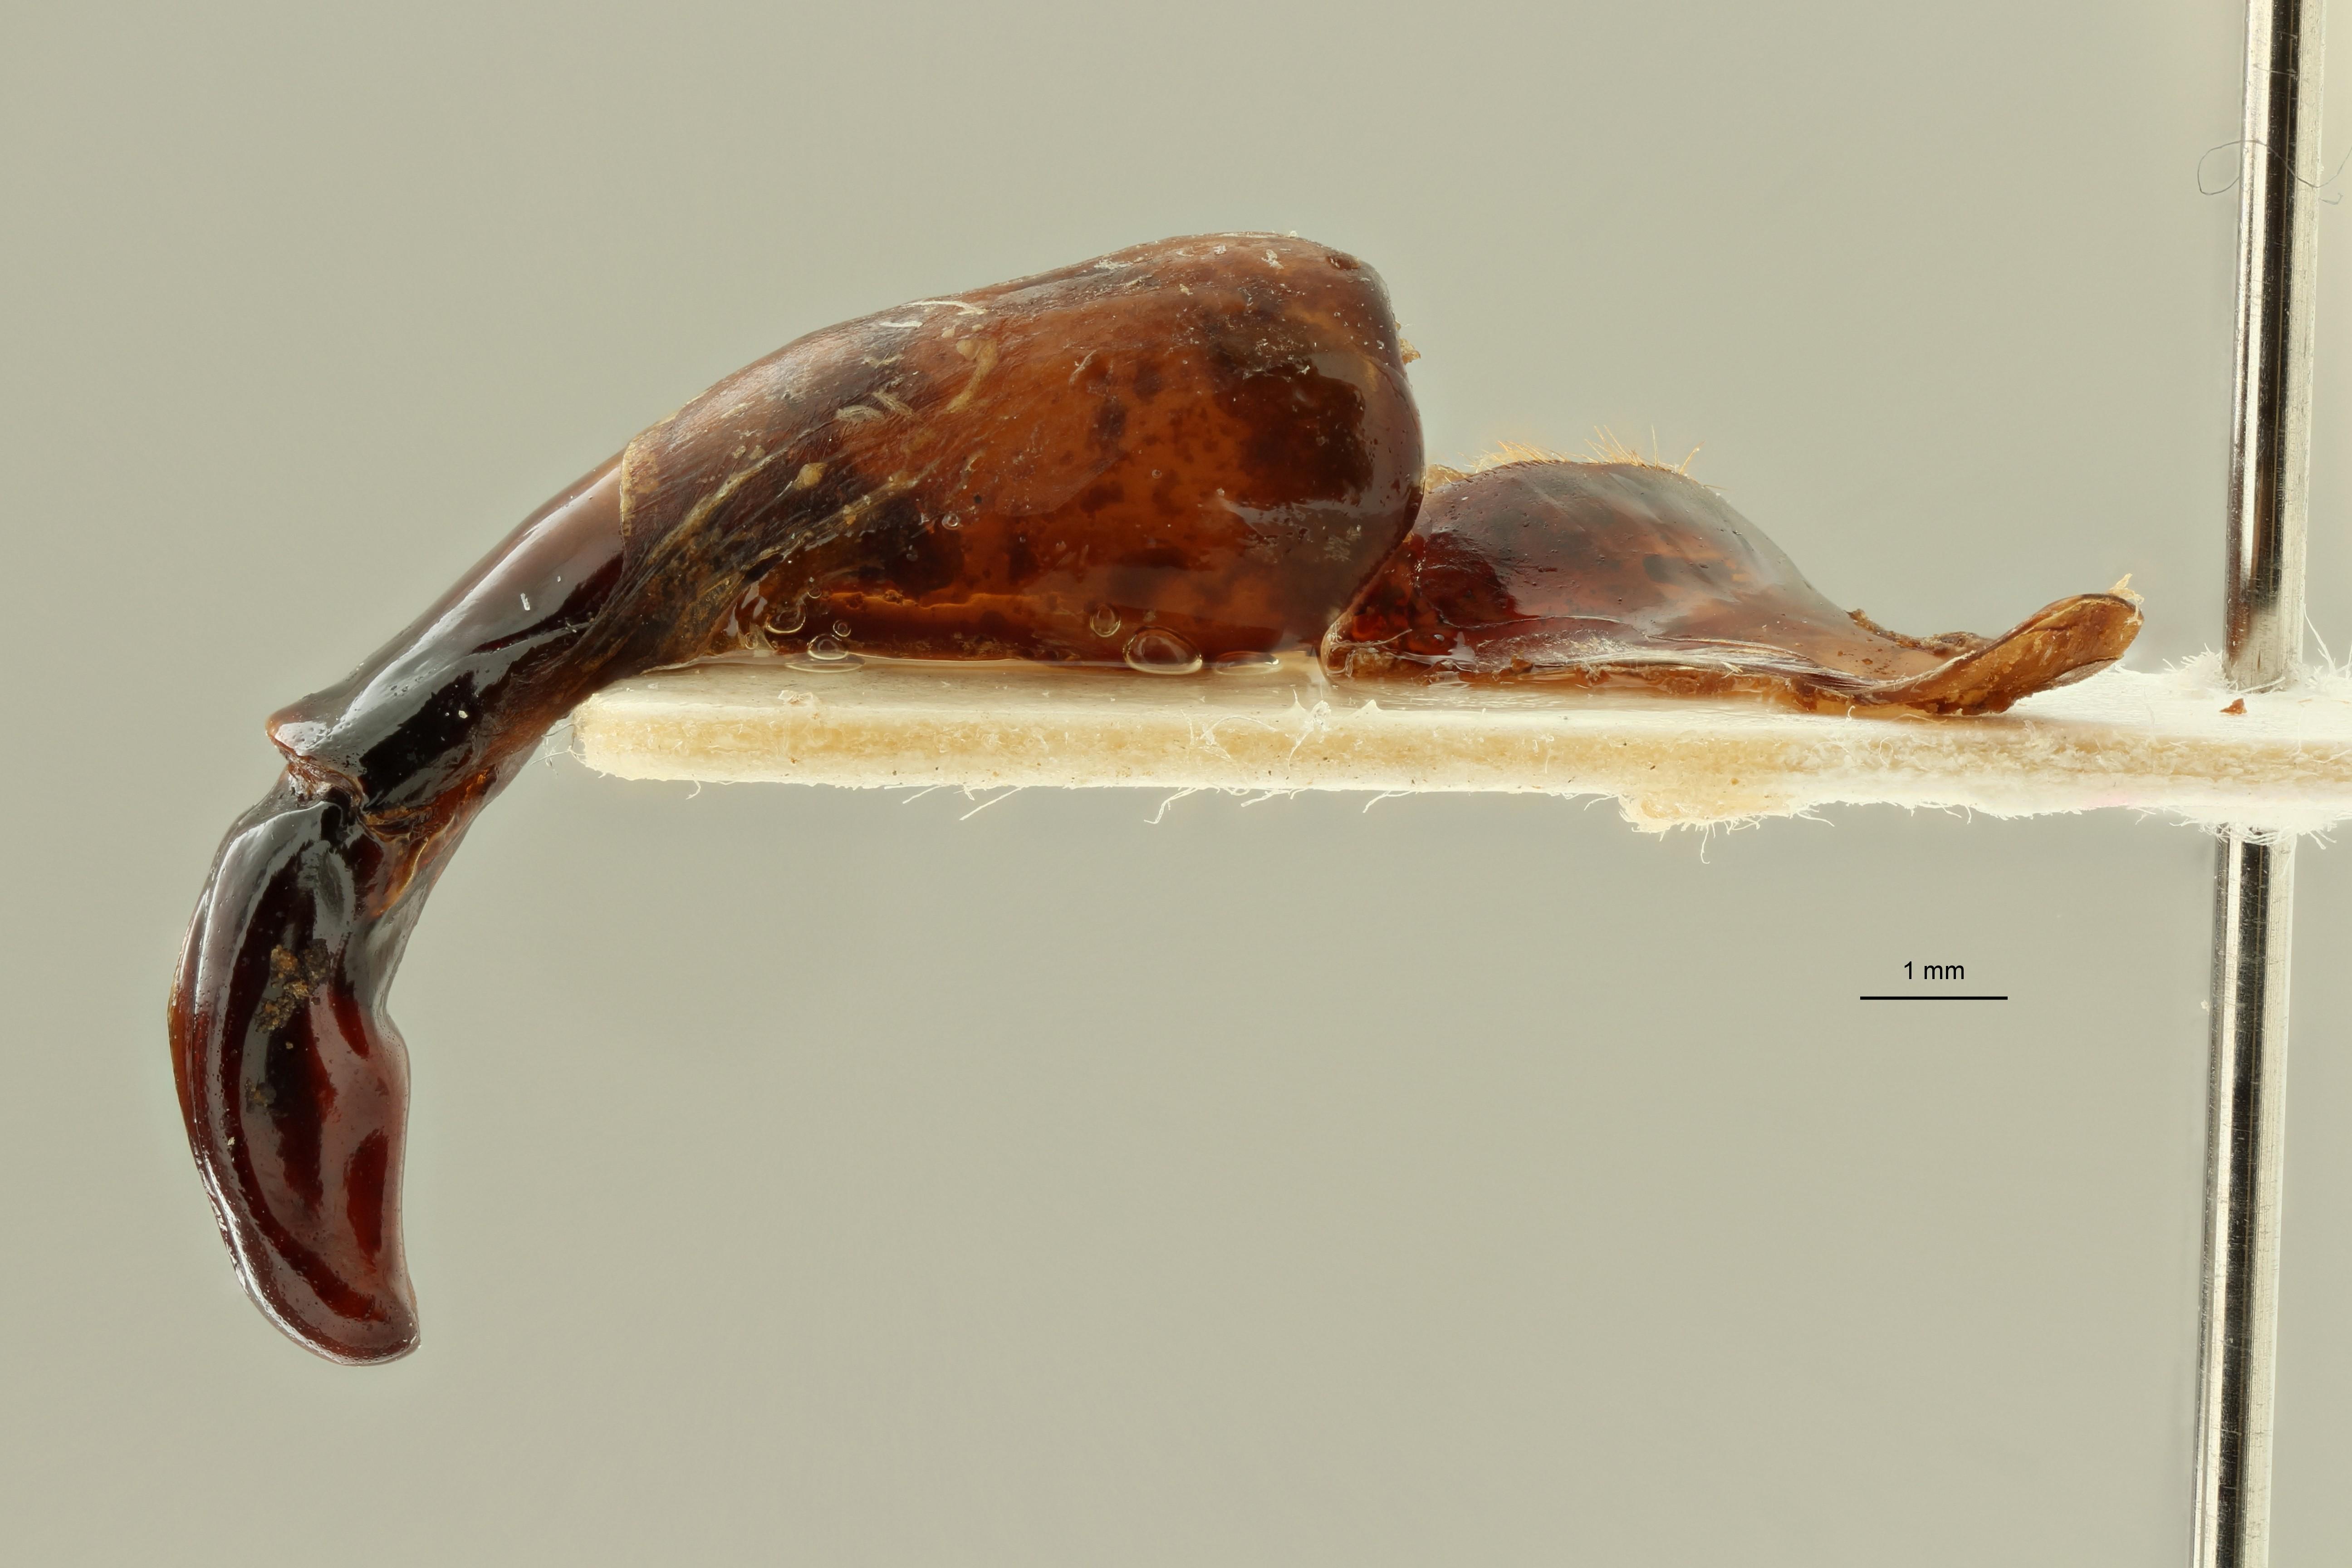 Eudicella (Eudicella) bouyeri ht LG ZS PMax Scaled.jpeg